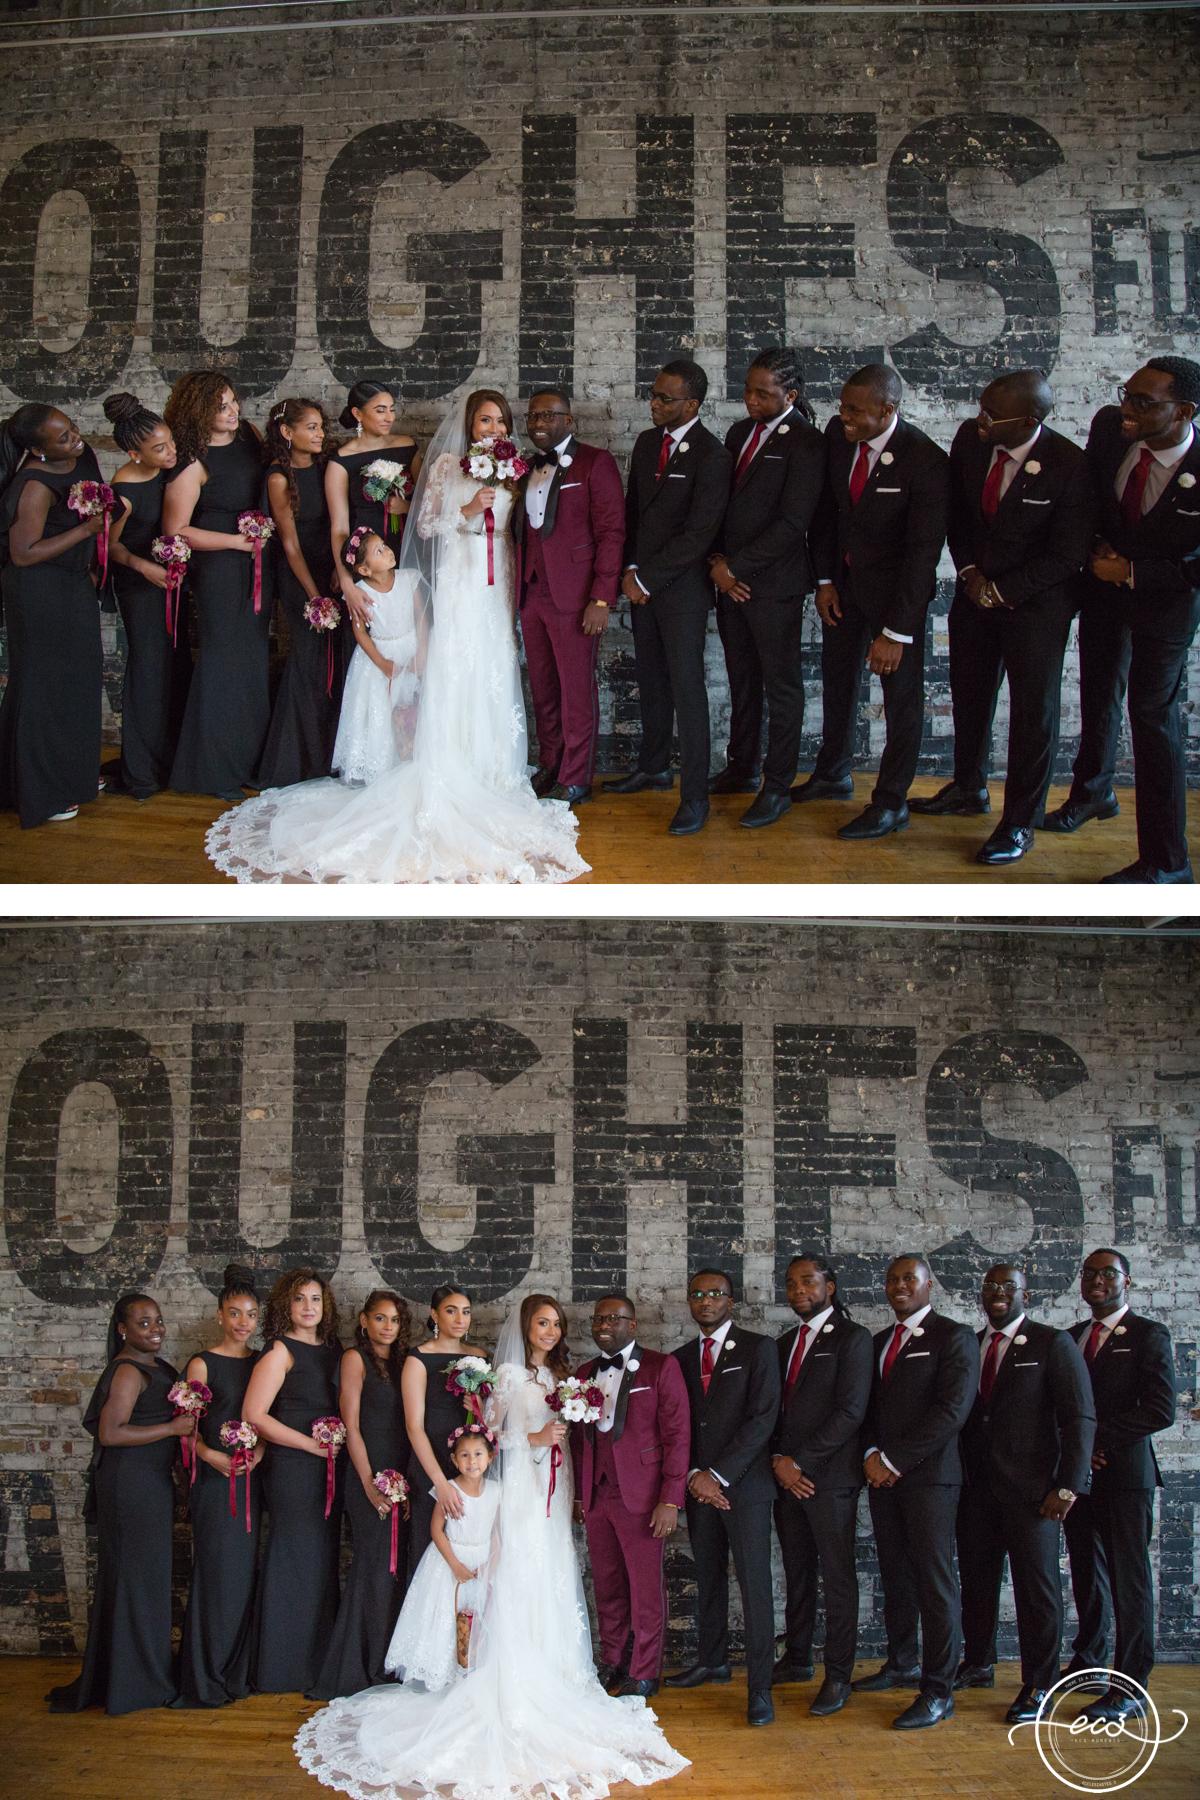 AA-Rustic-Toronto-Burroughes-Wedding29.jpg